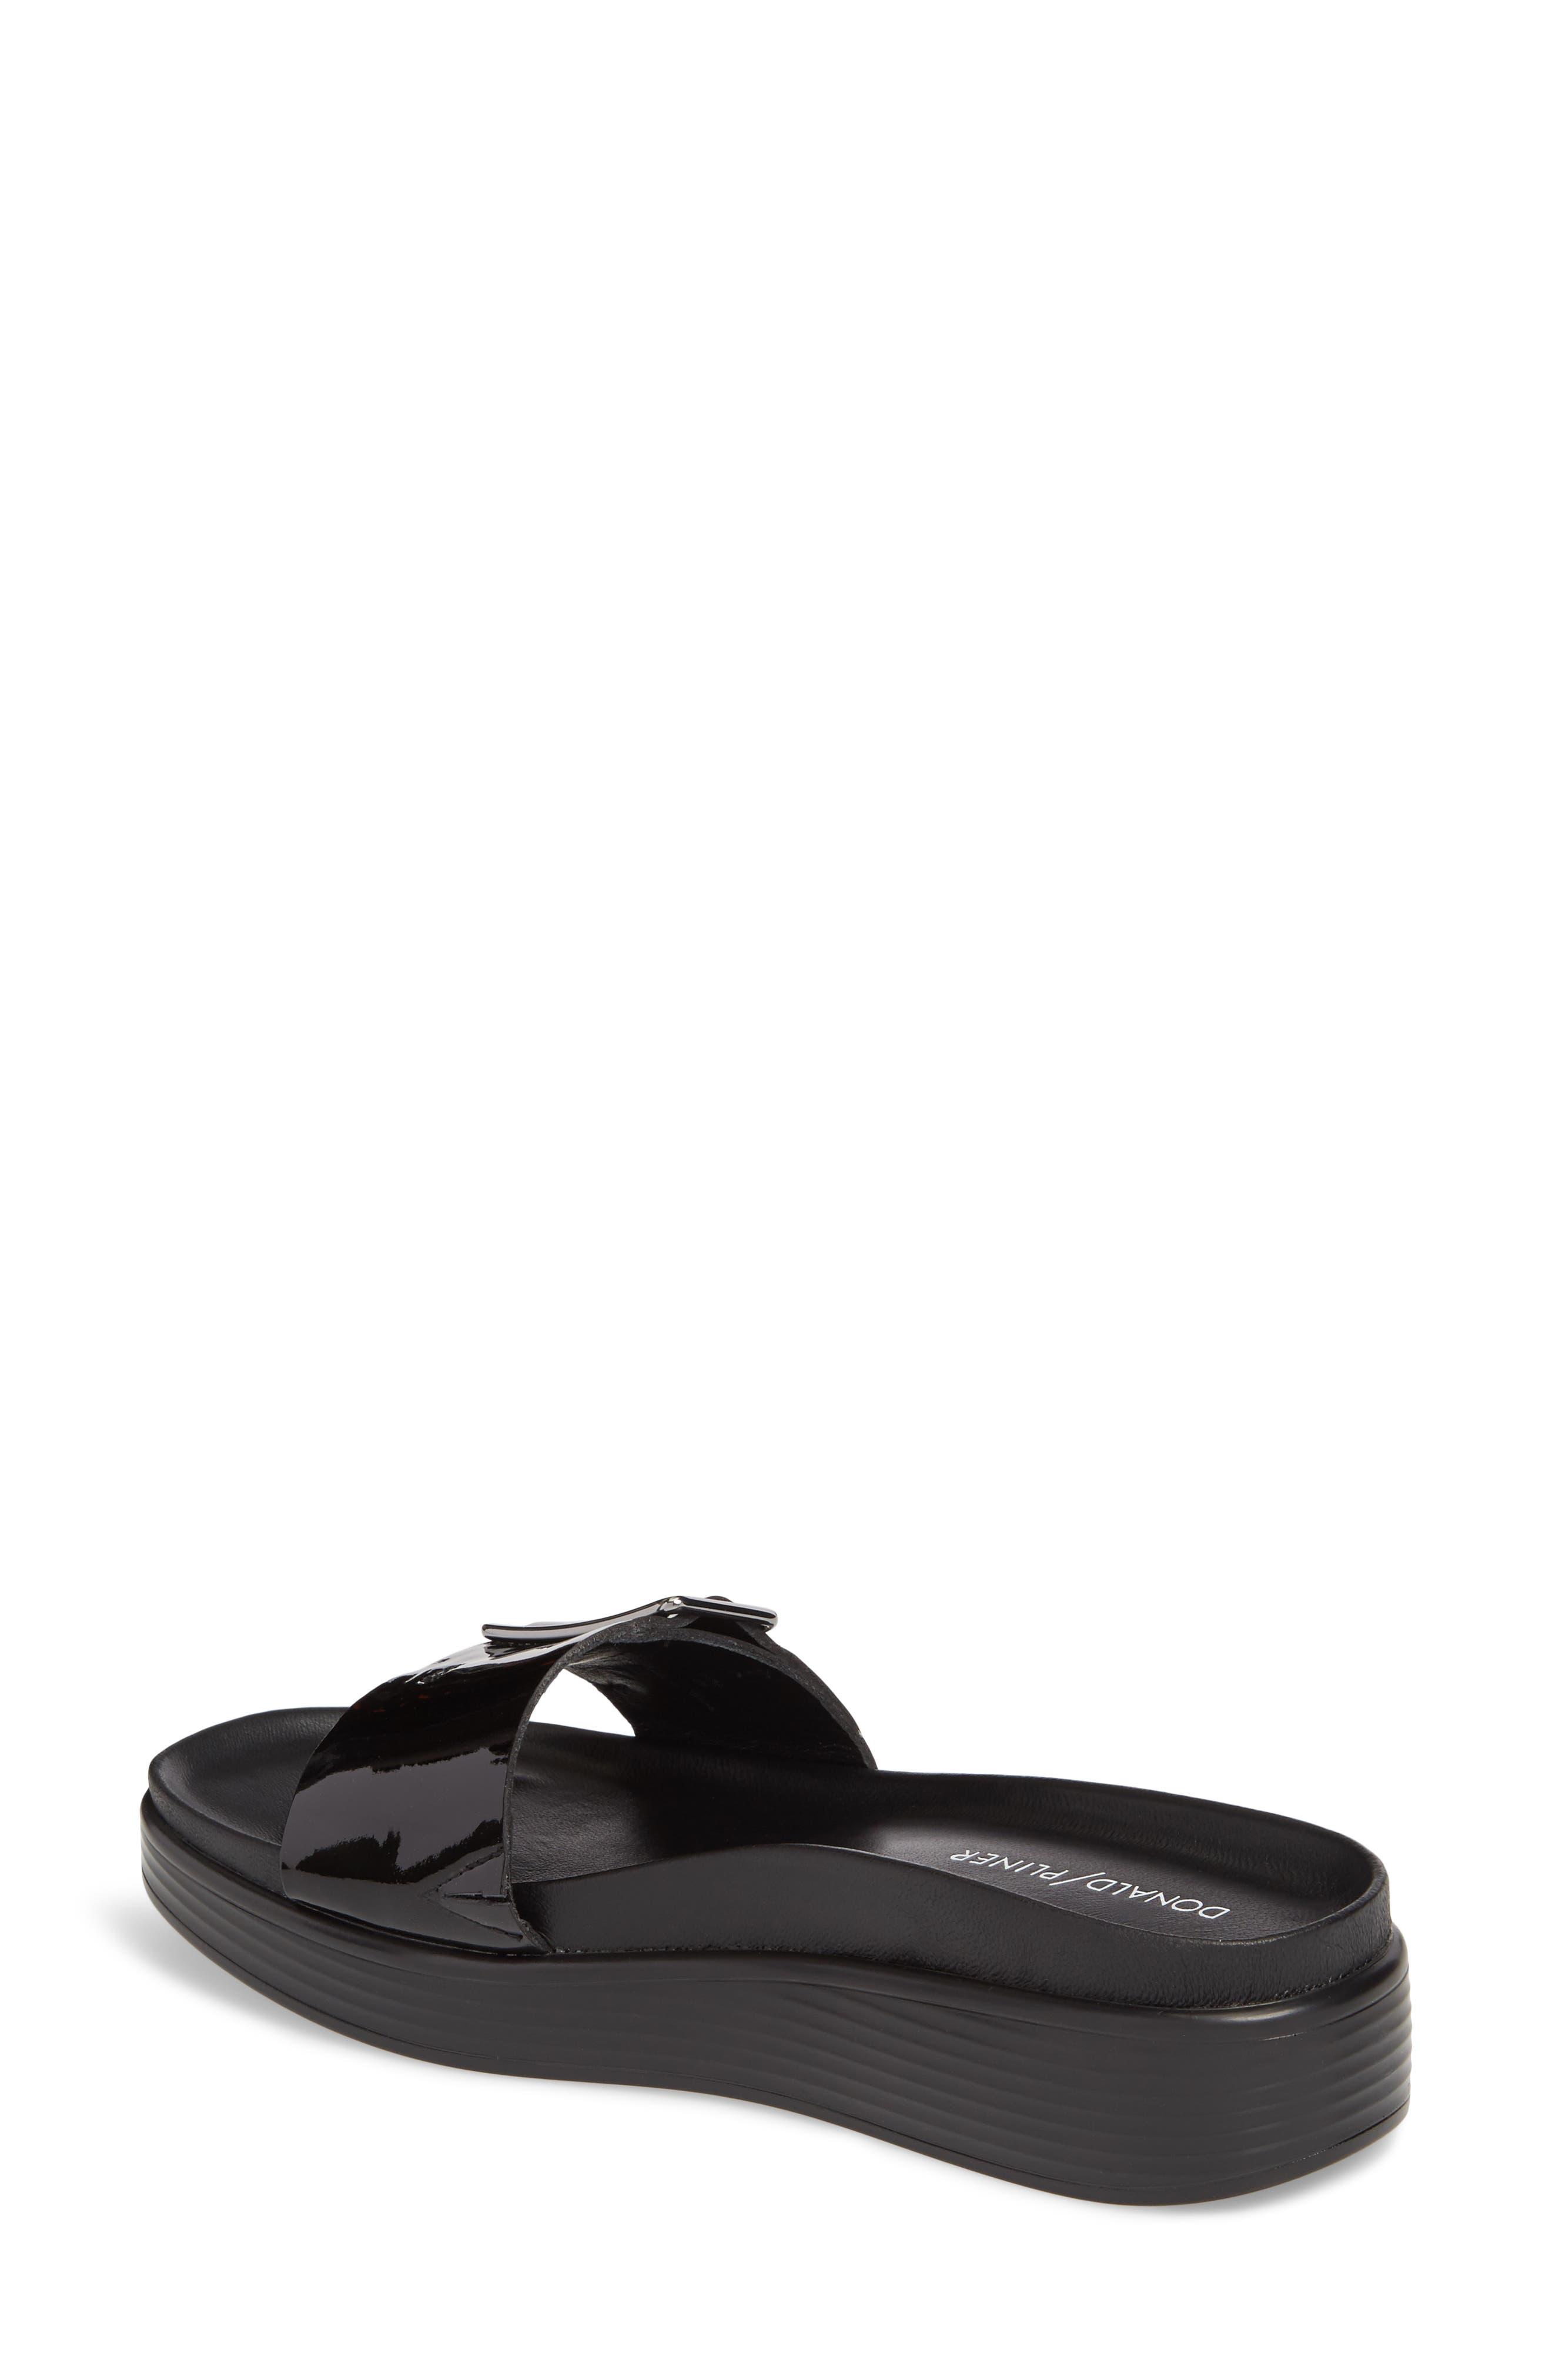 Fara Platform Slide Sandal,                             Alternate thumbnail 2, color,                             001